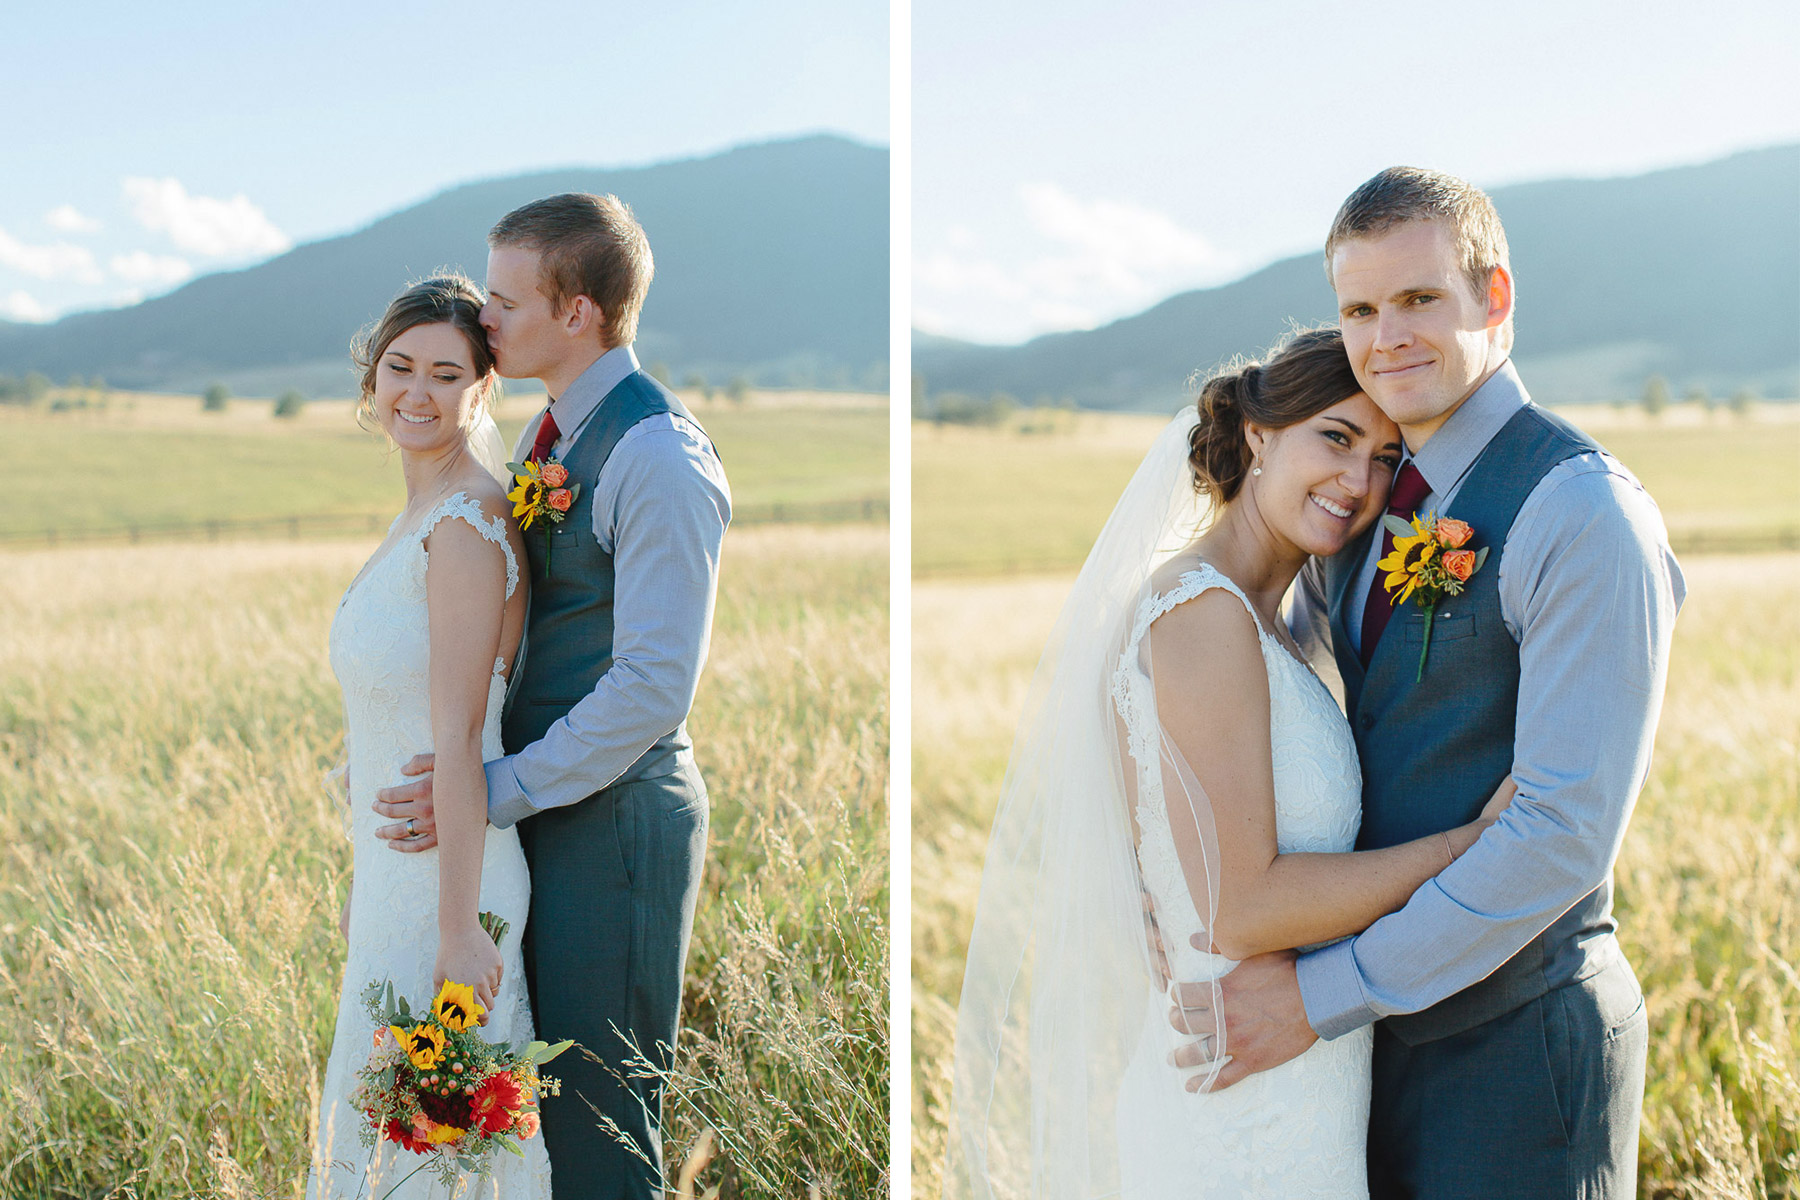 160902-Luxium-Weddings-Arizona-Michael-Becca-Spruce-Mountain-Ranch-Colorado-webres-079a.jpg